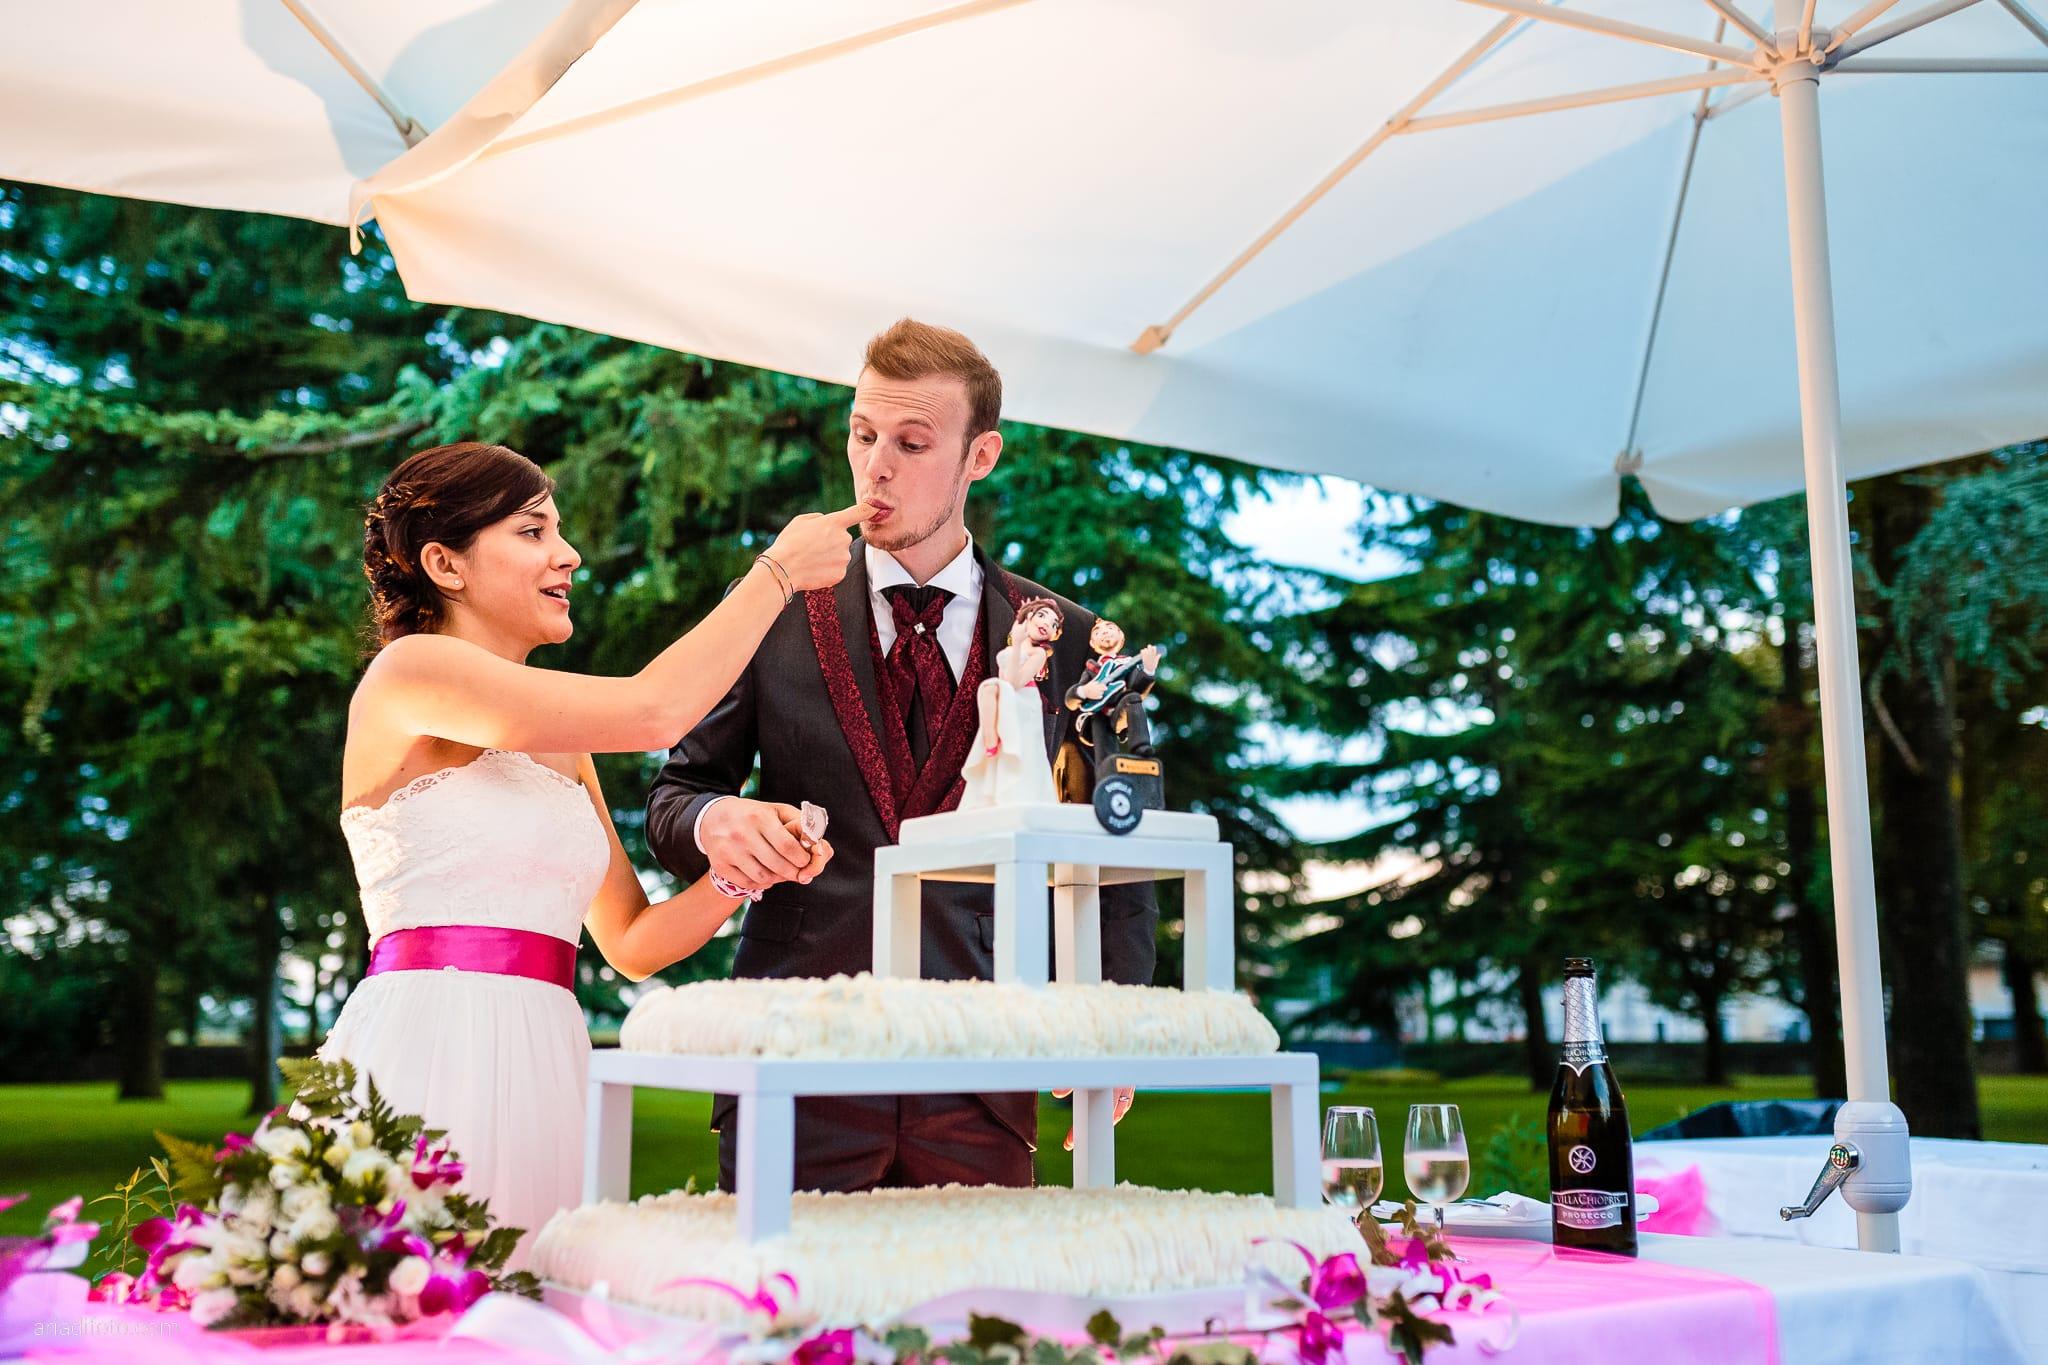 Dorella Stefano matrimonio Cormons Villa Chiopris Udine ricevimento torta